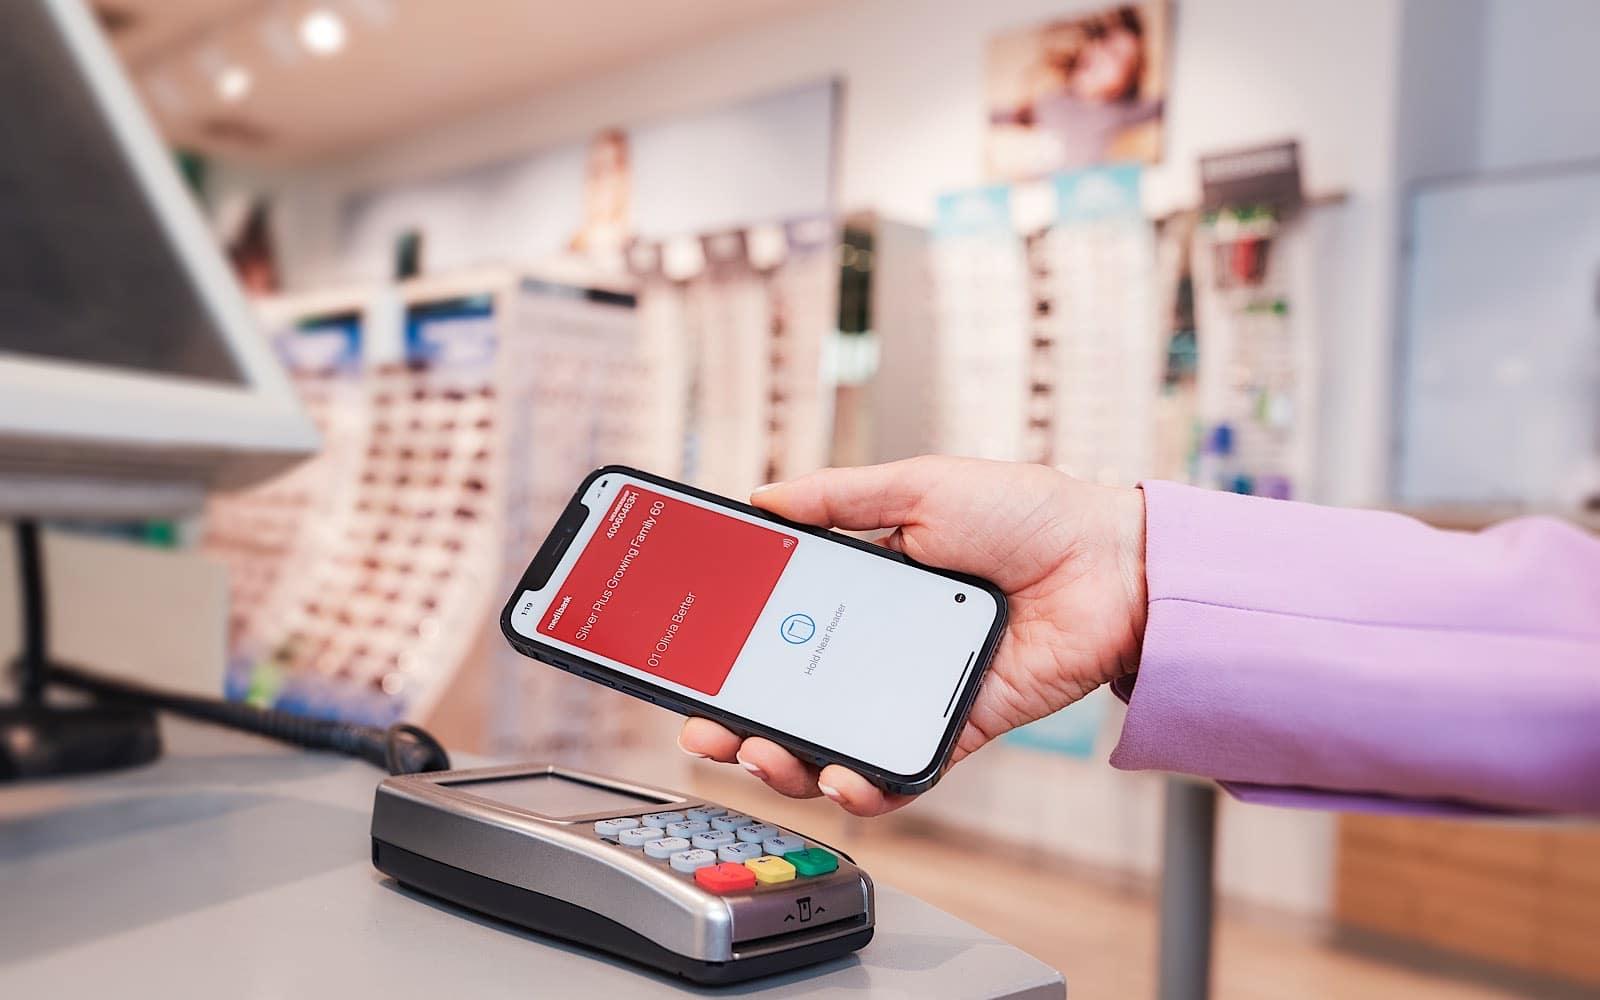 Australian health insurance cards on the iPhone